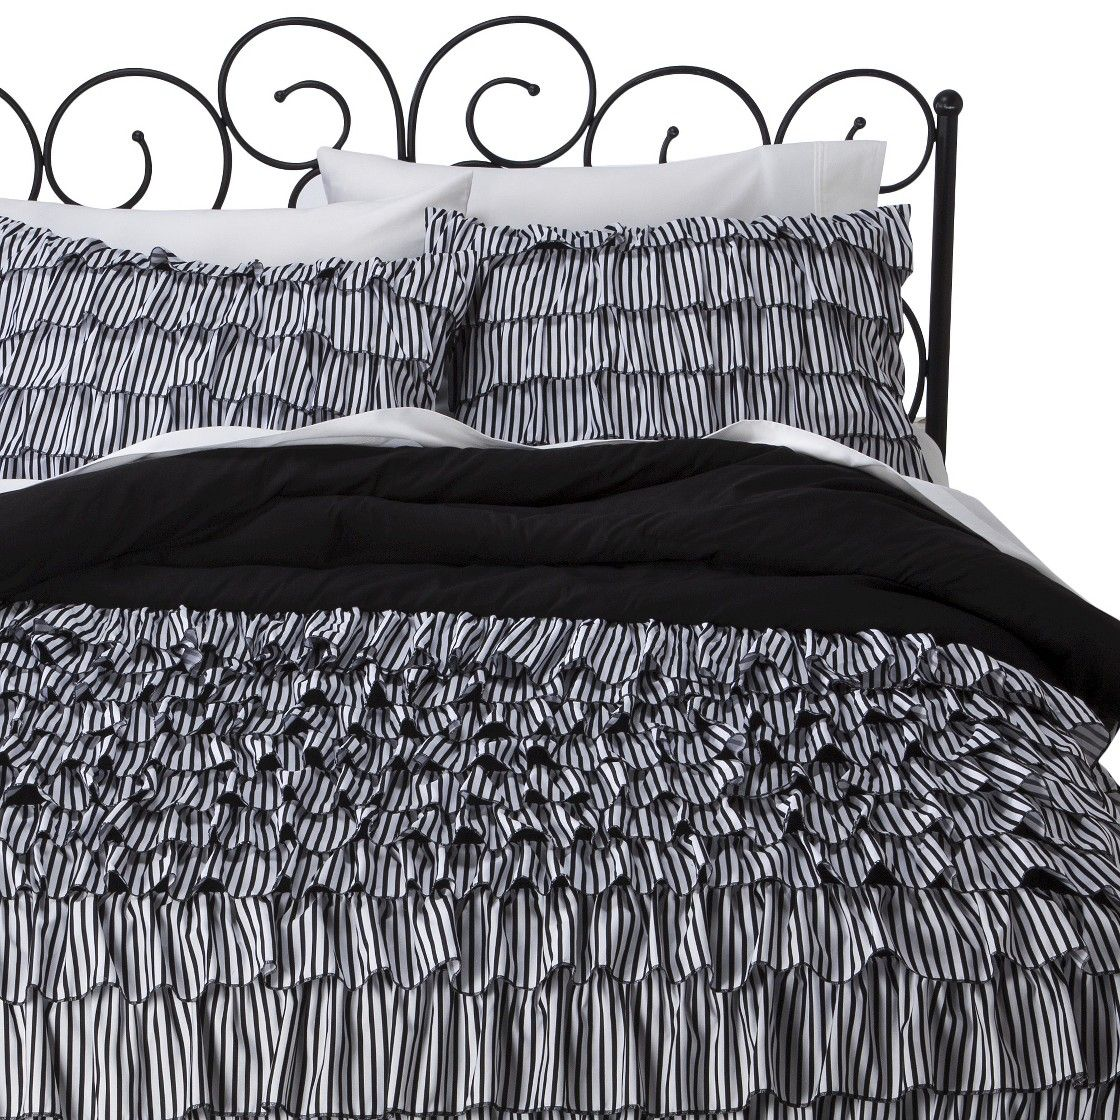 Xhilaration Ruffle Comforter Set http://m.target.com/p